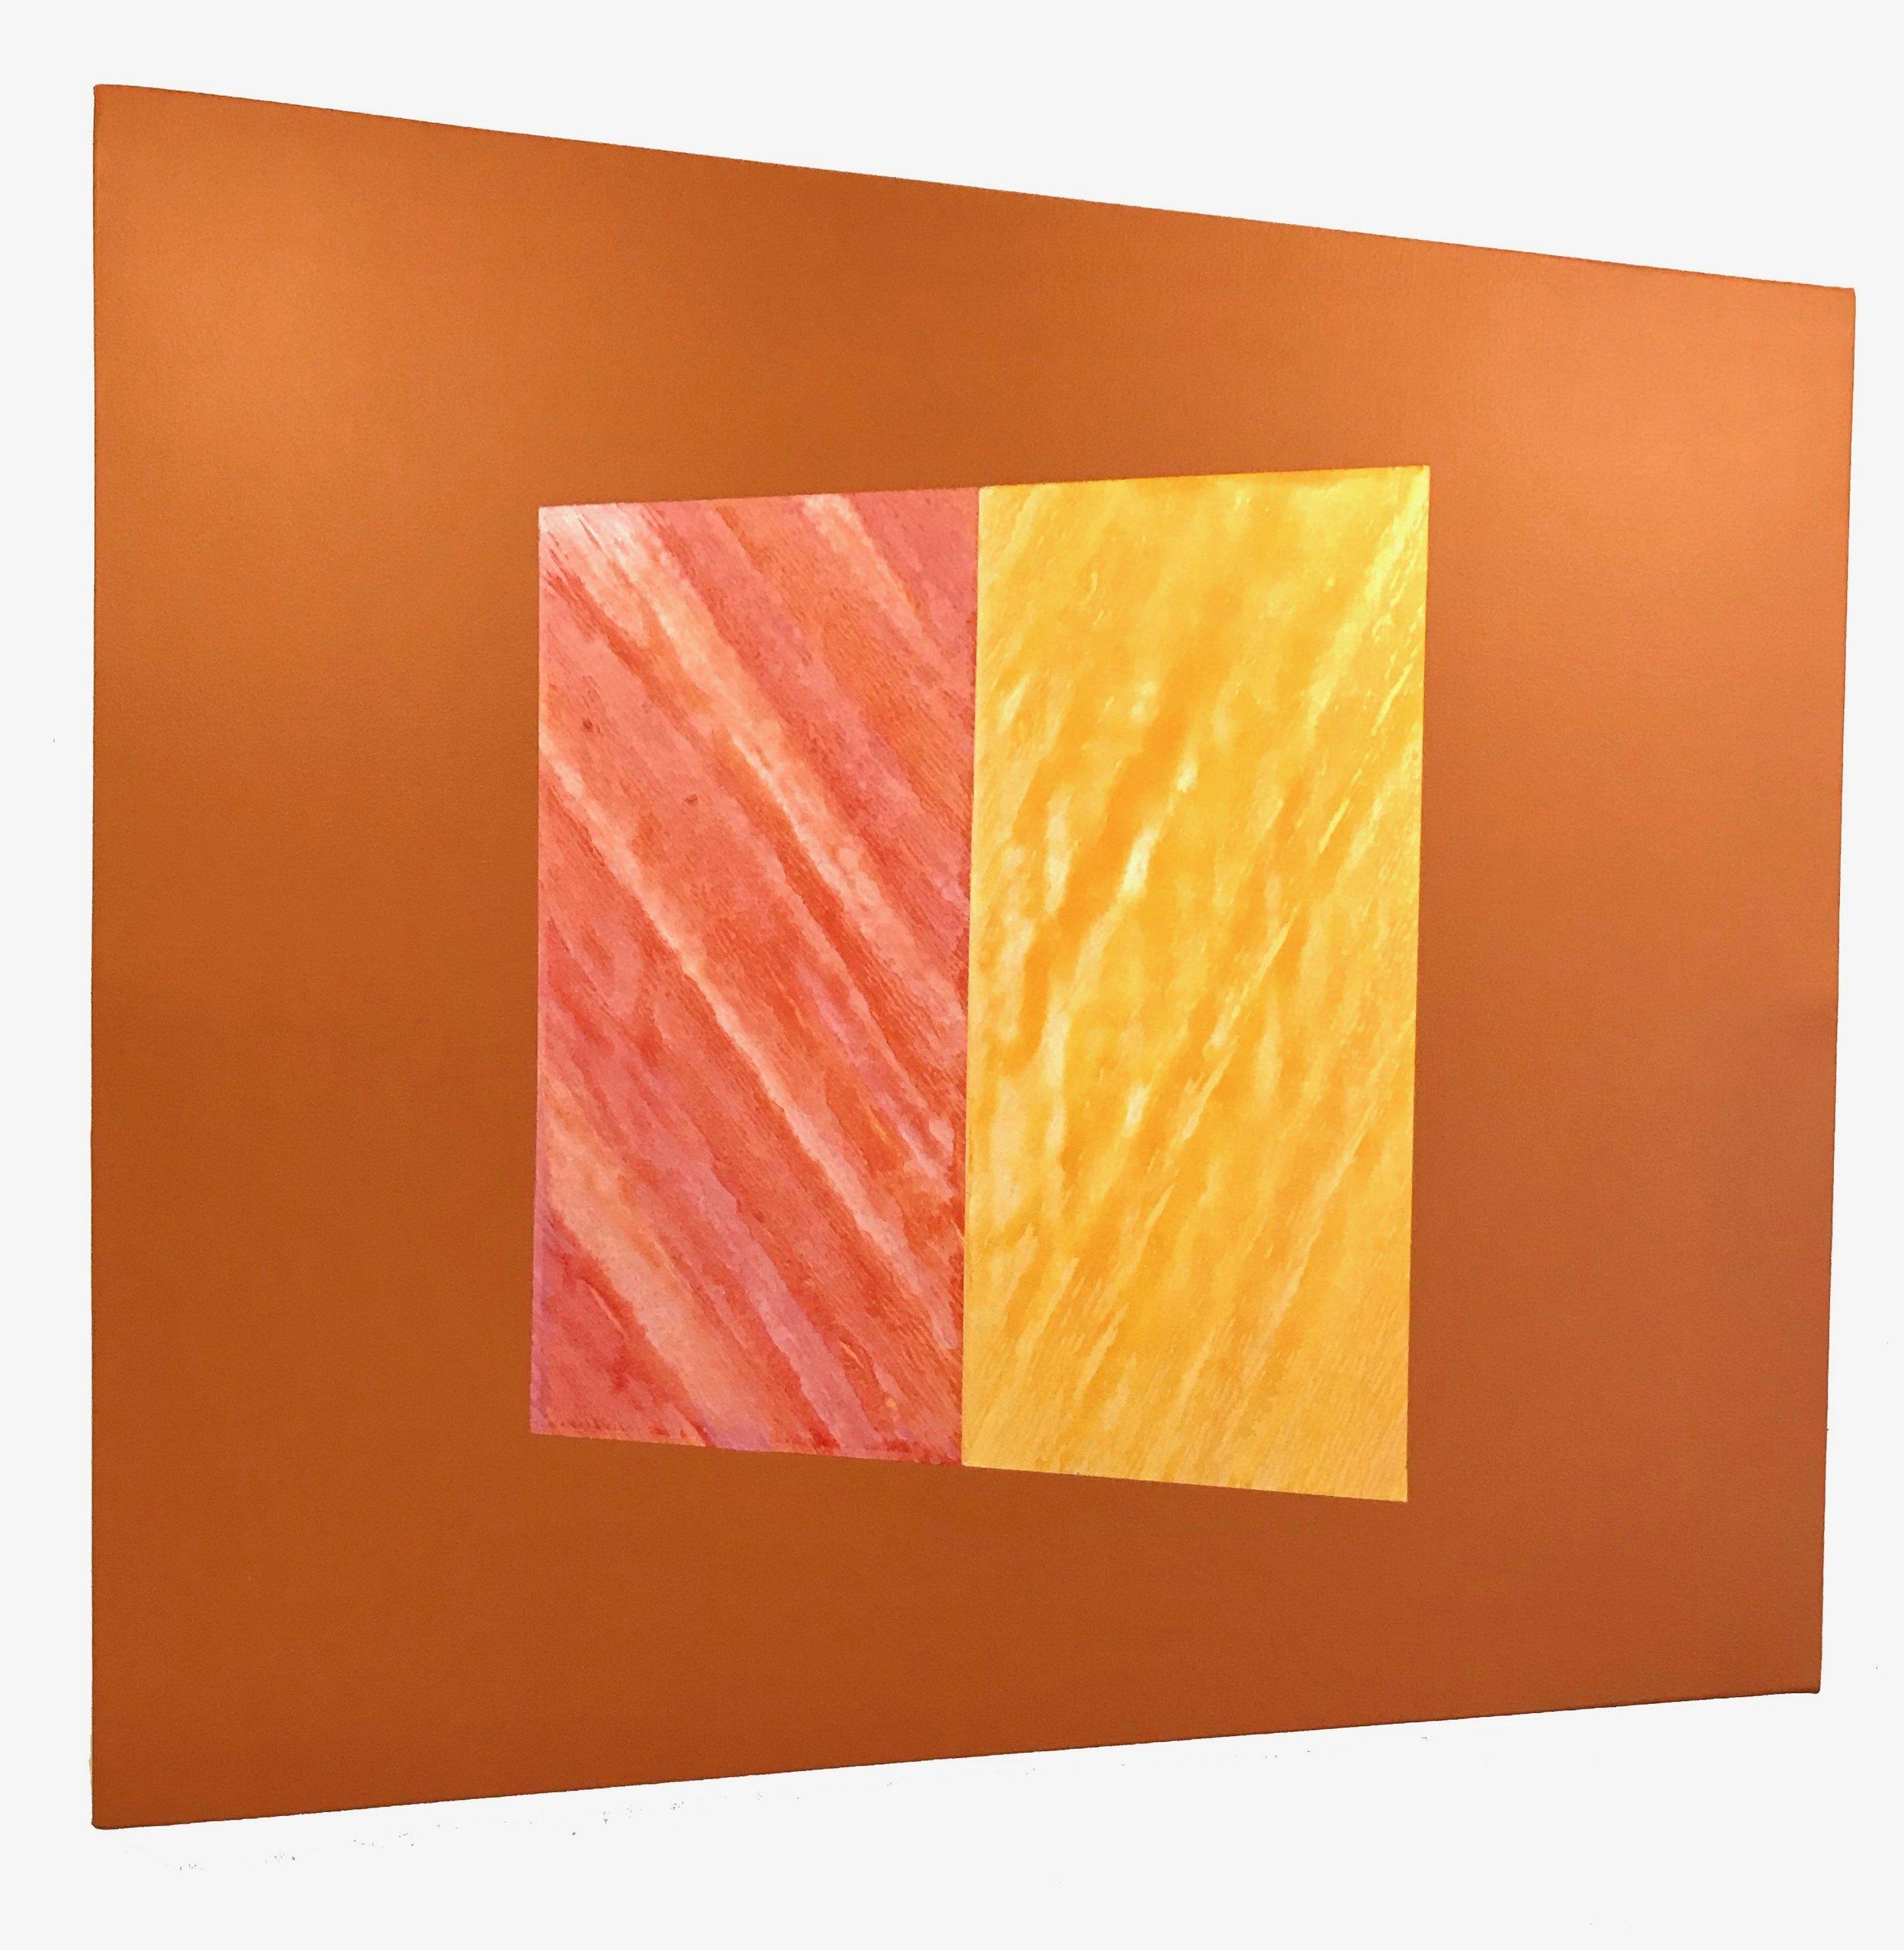 "Torque 2, 2018, 48"" x 48"", acrylic on canvas over panel"